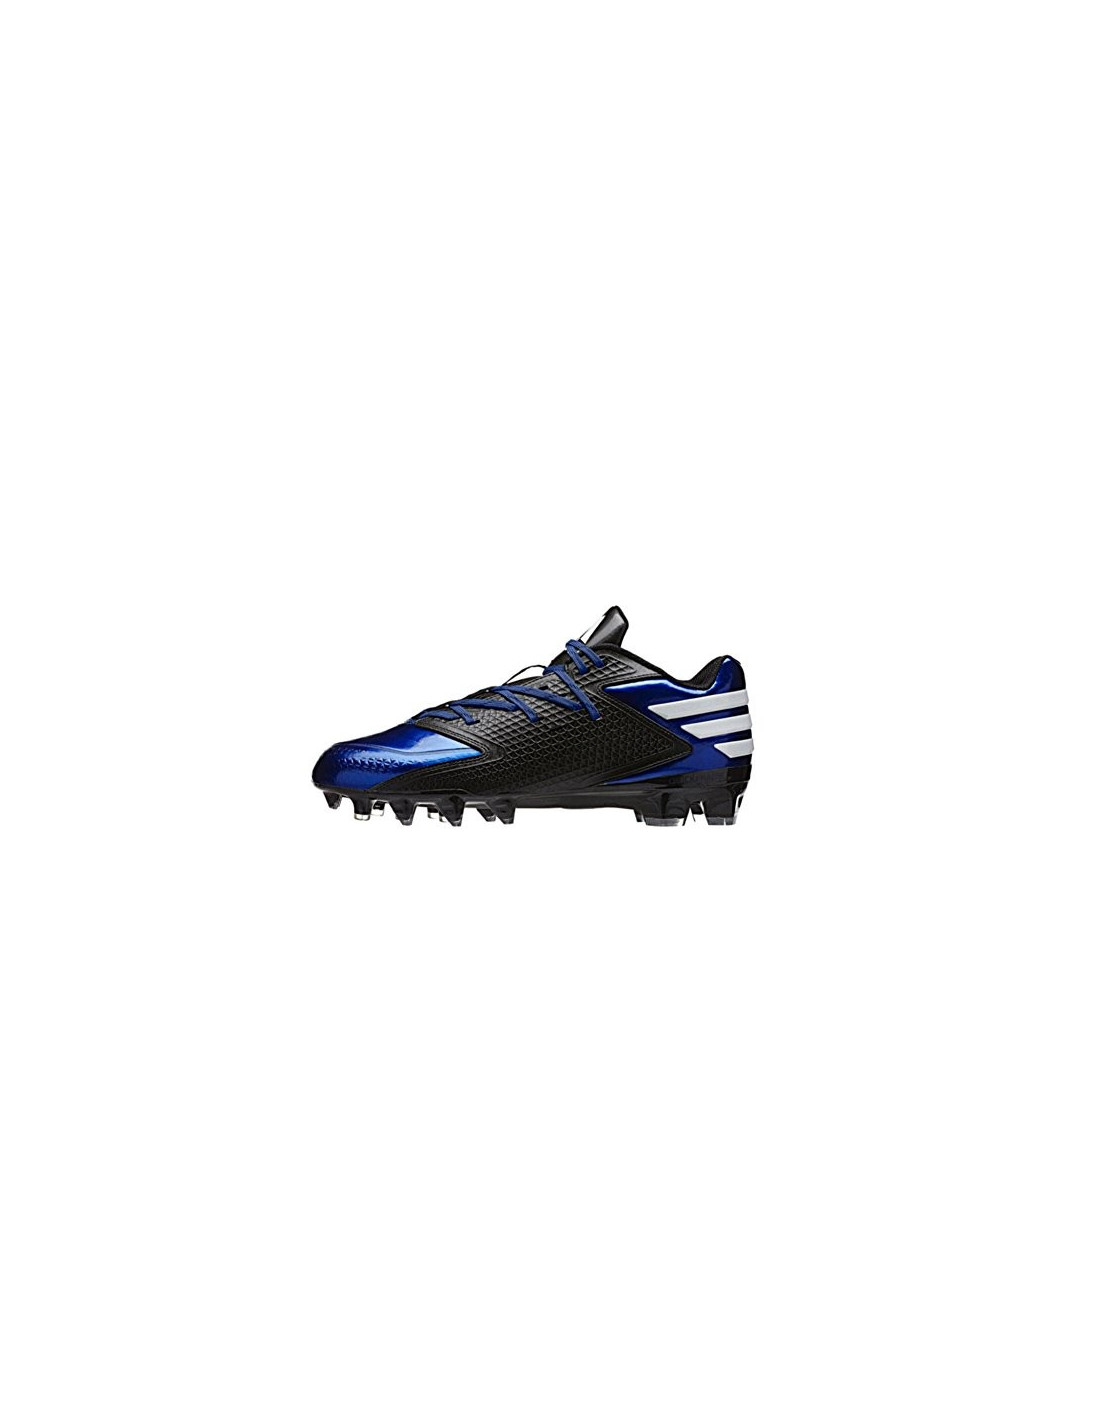 best website eea2d 9ea07 Adidas Freak X Carbon Low Mens Football Cleat ...